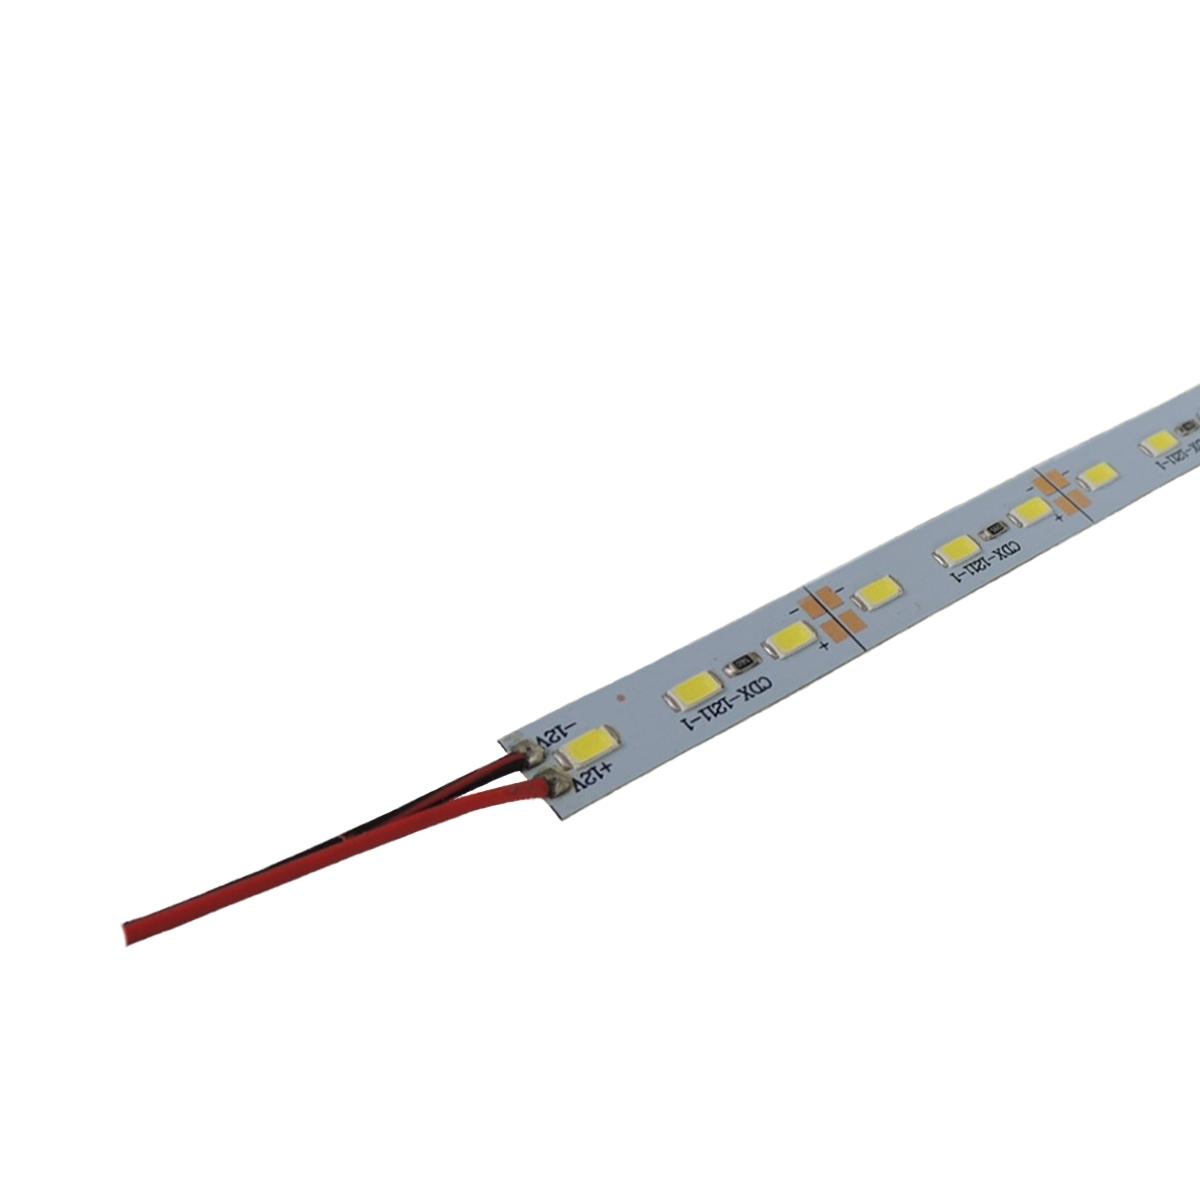 FITA RIGIDA LED IP20 5630 12V 15W 1,00M 2700K - i9 LED